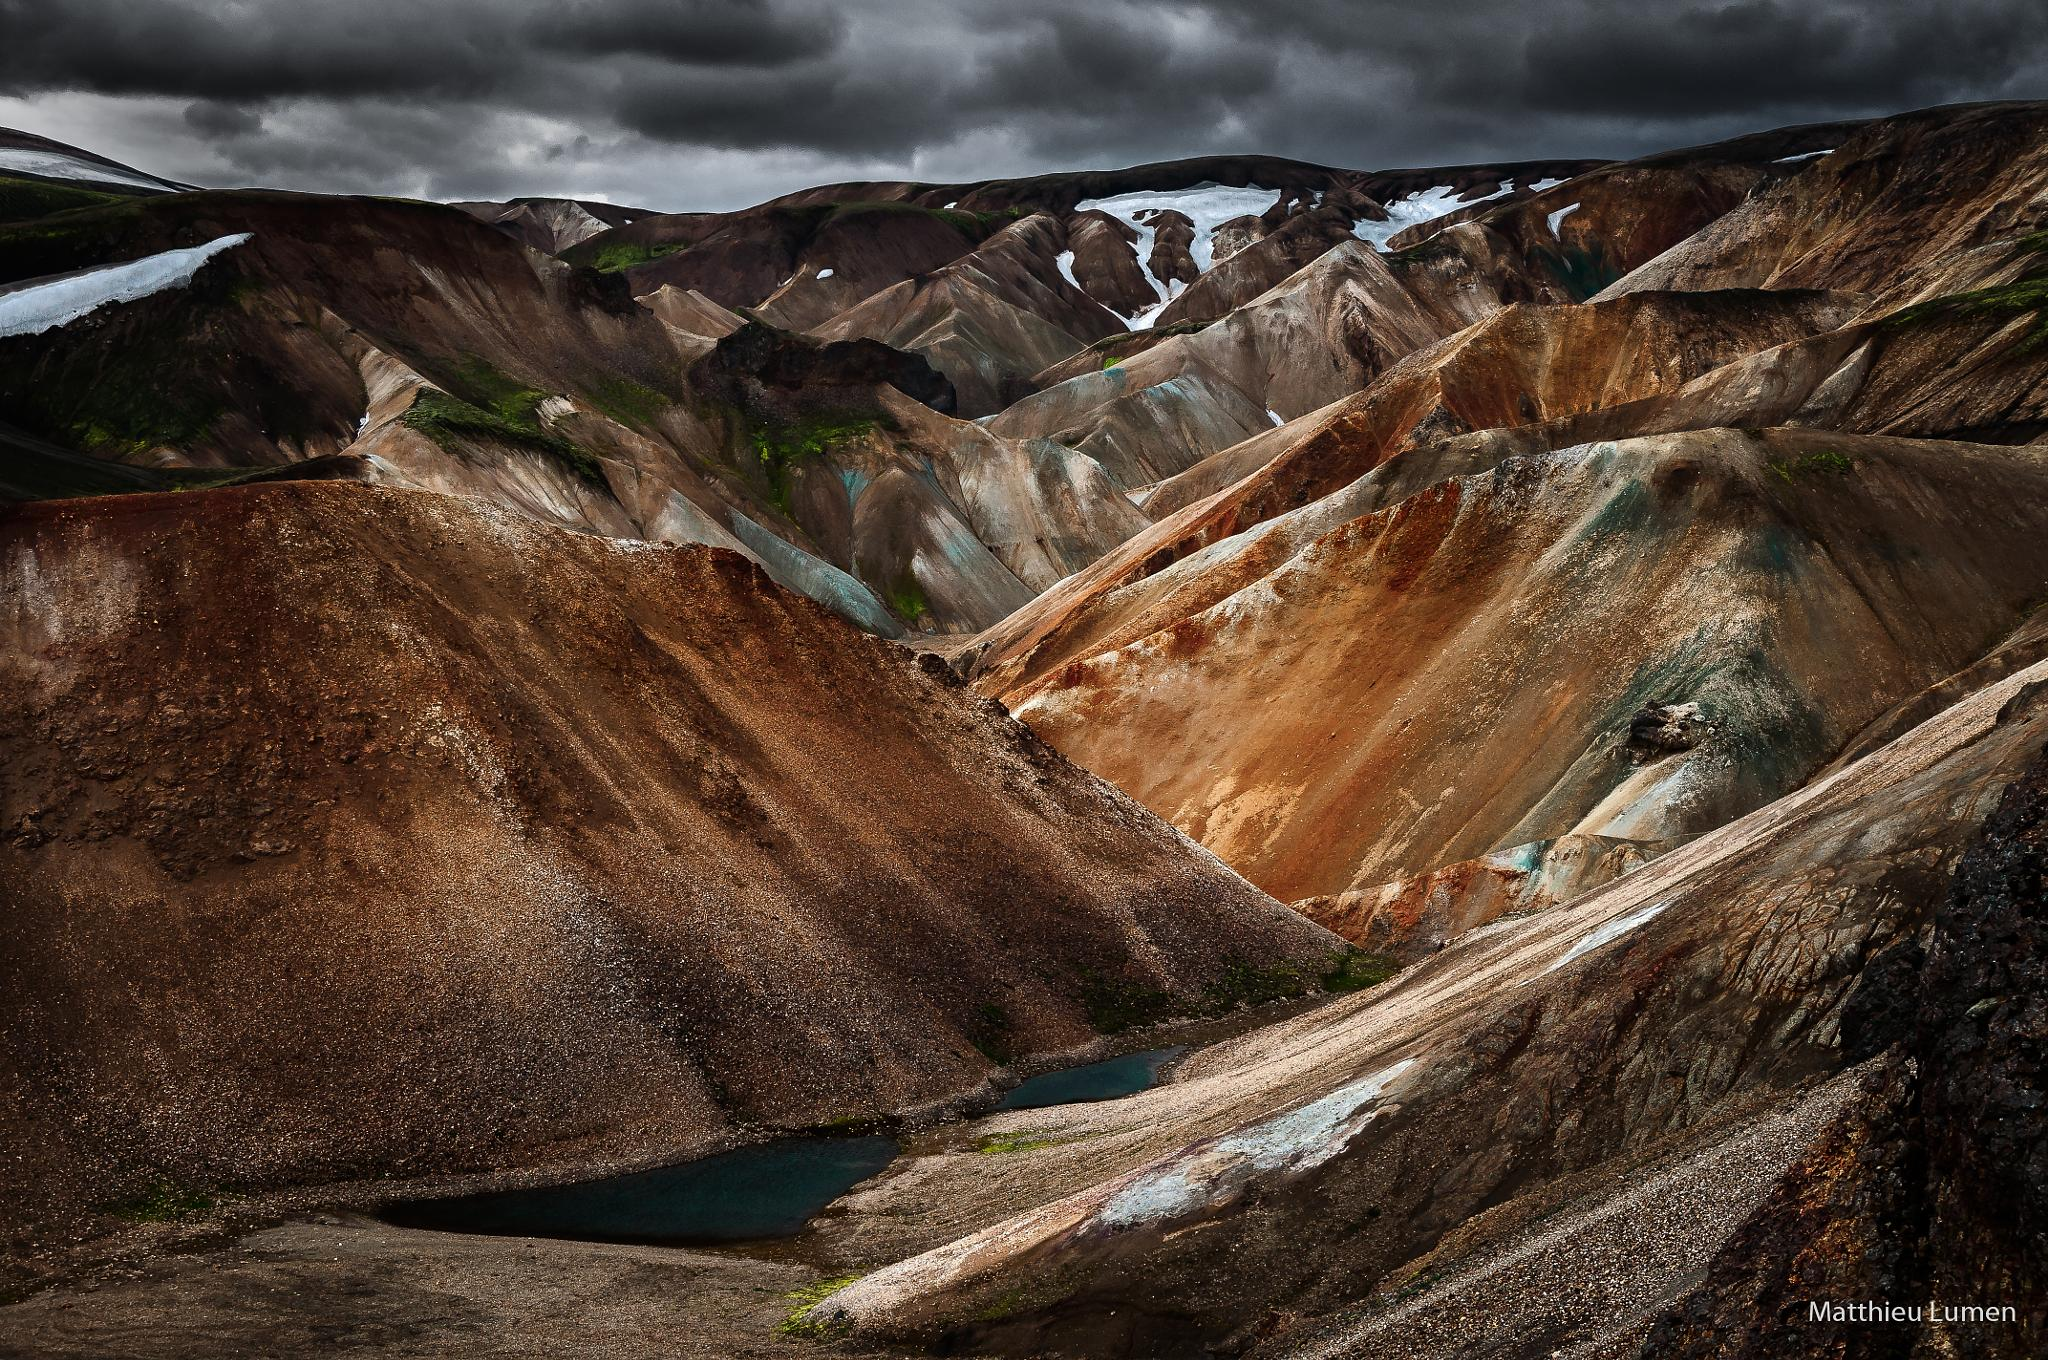 Desert Hills by Matthieu Lumen